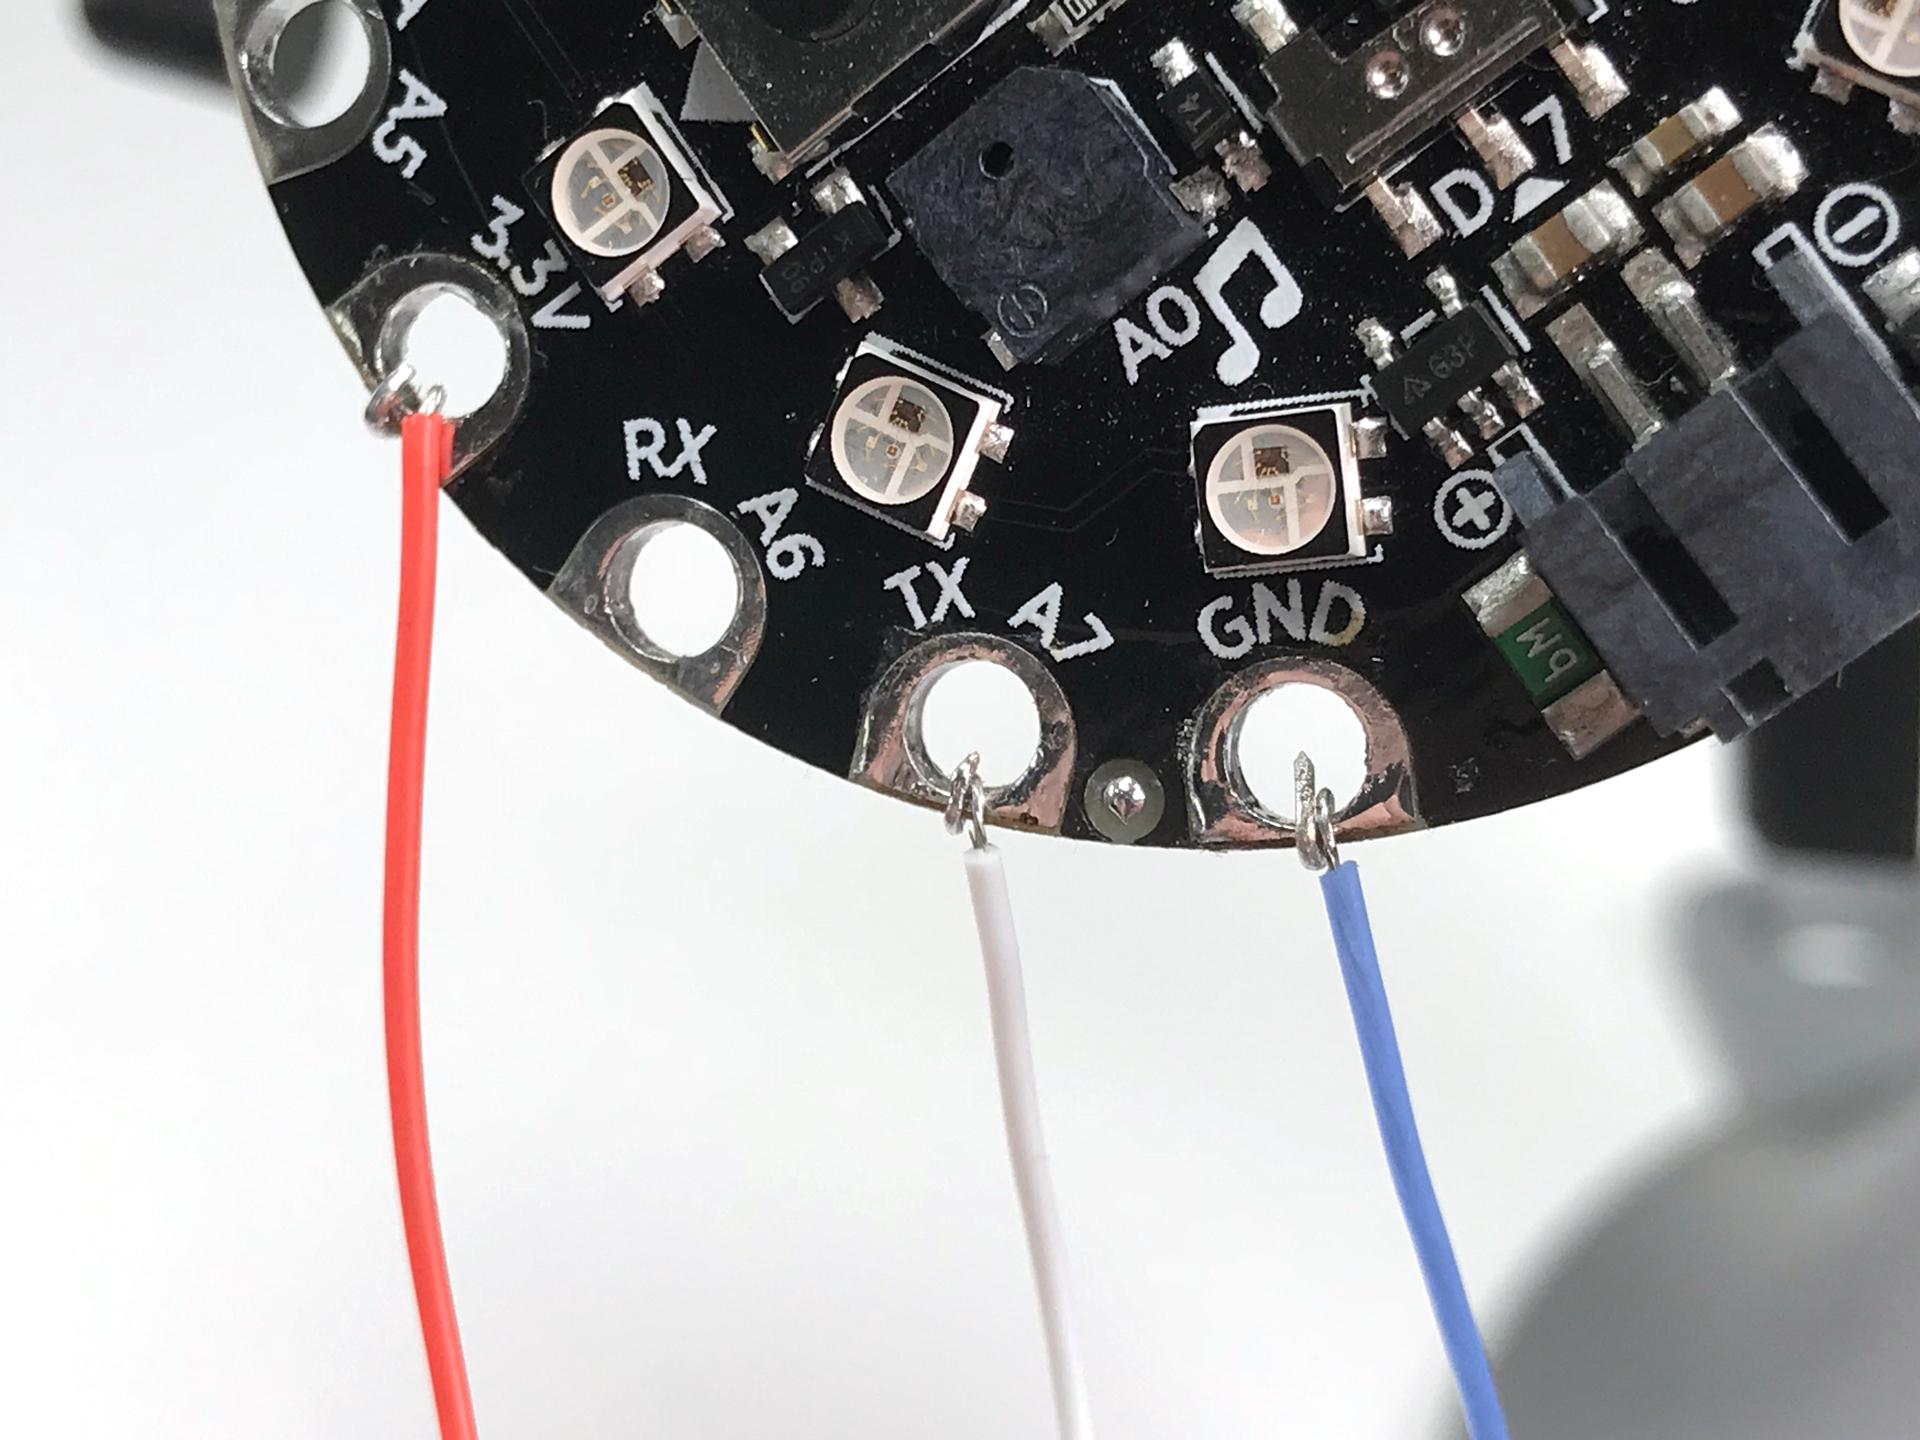 circuitpython_labo-4a.jpg